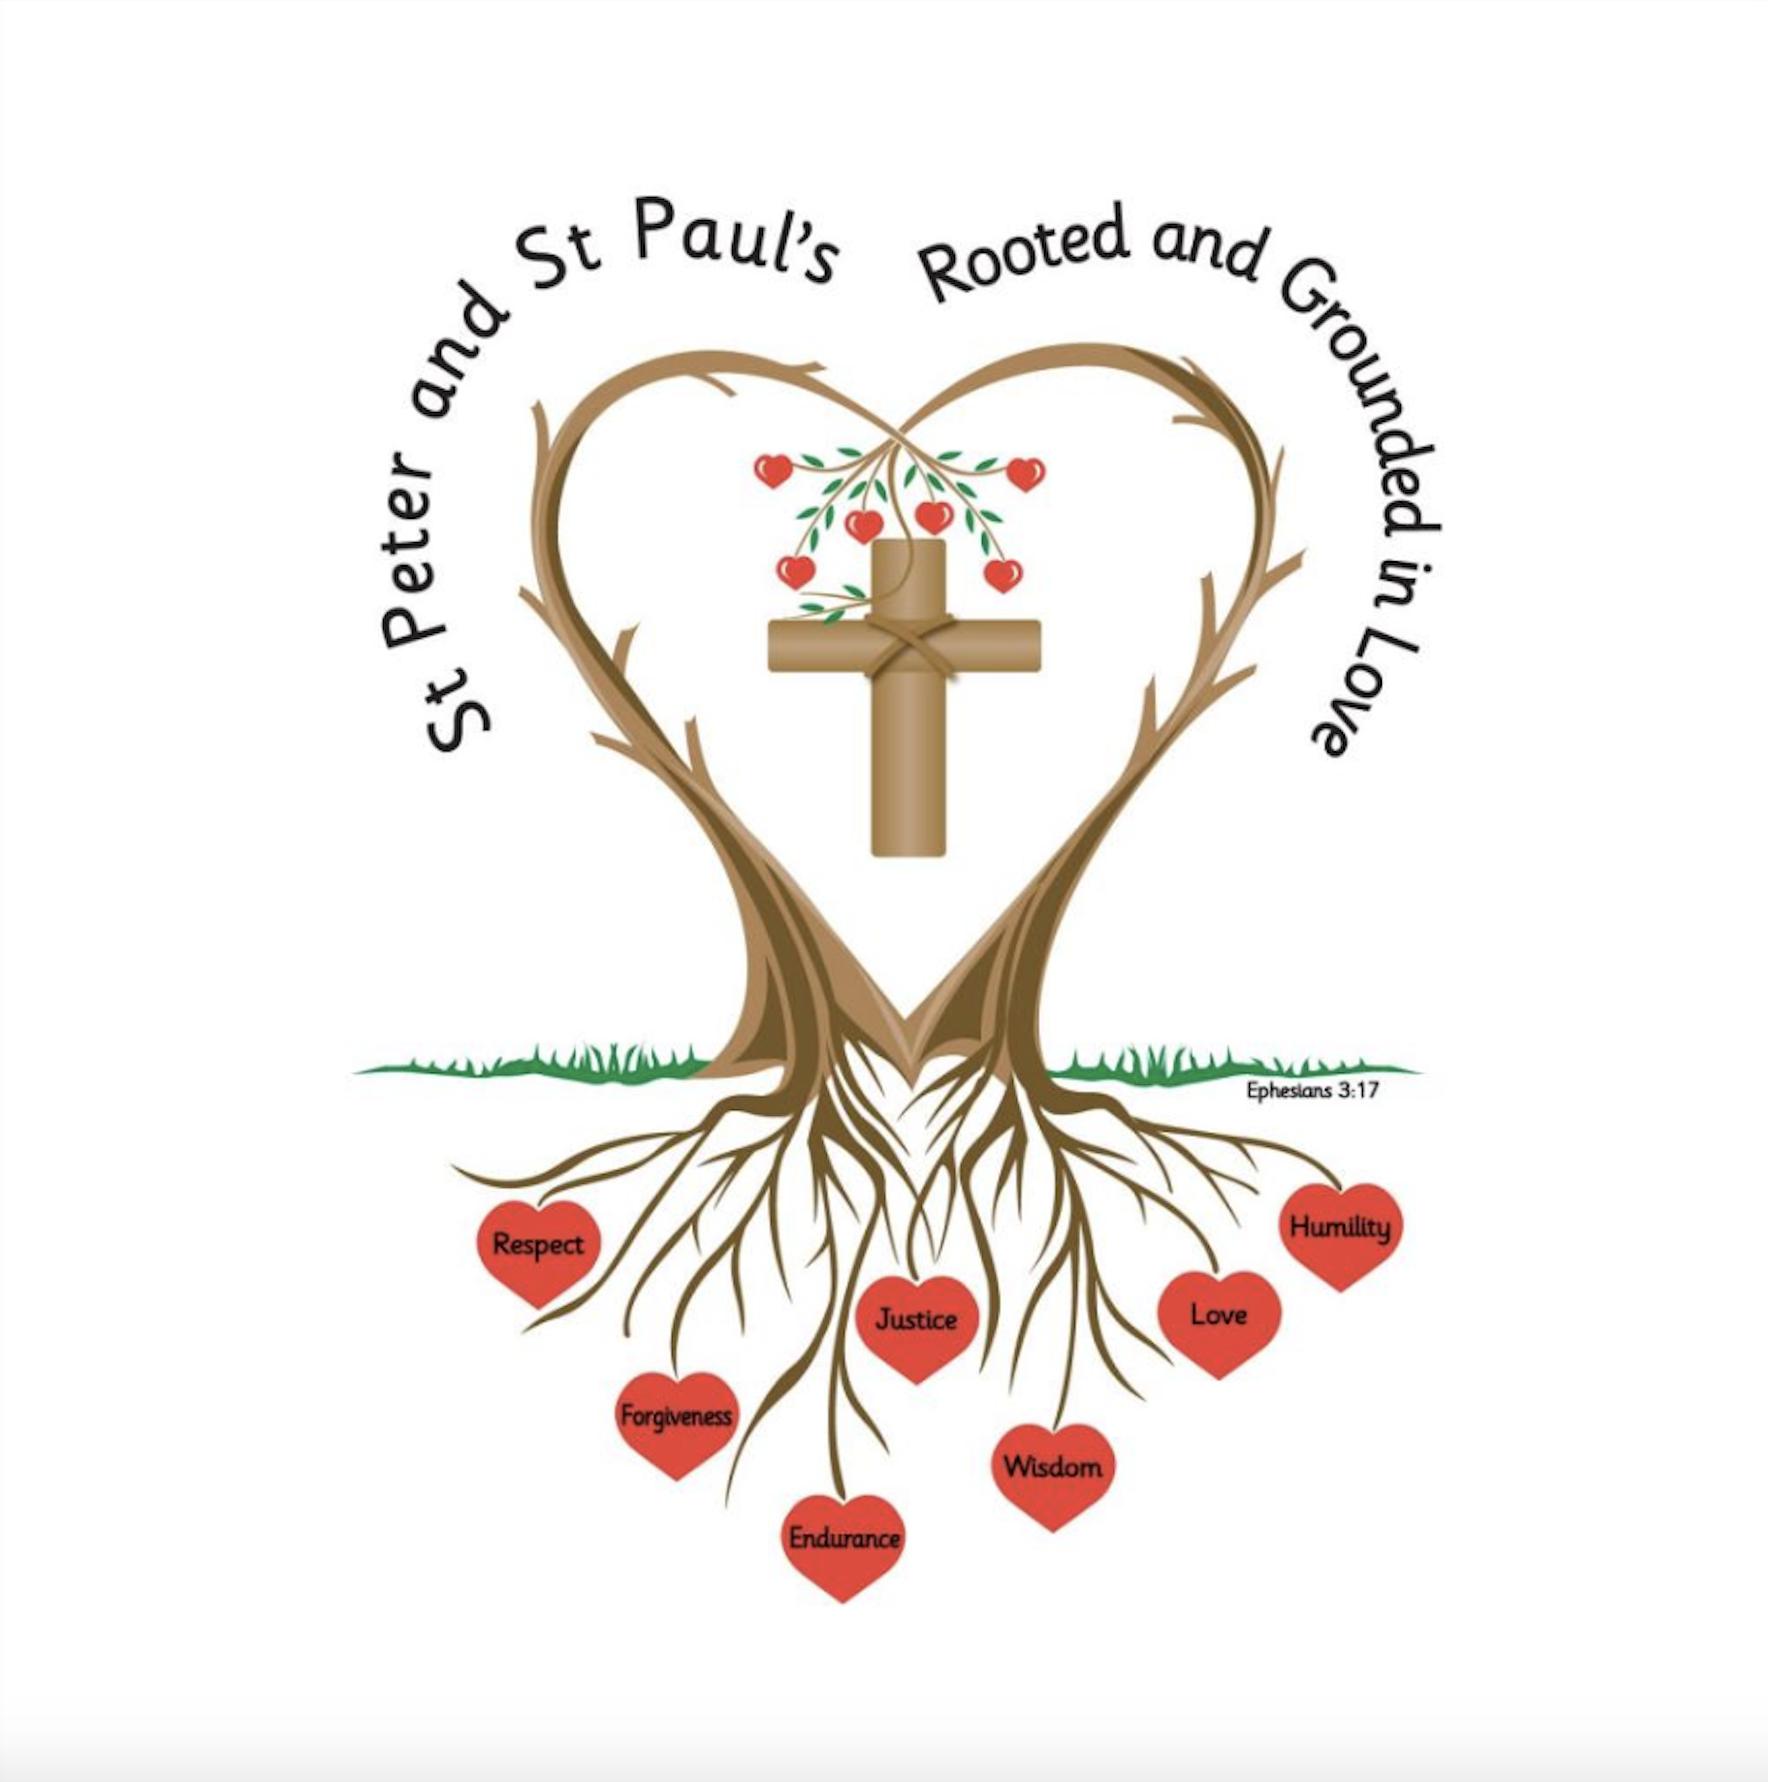 St Peter & St Paul's Polo